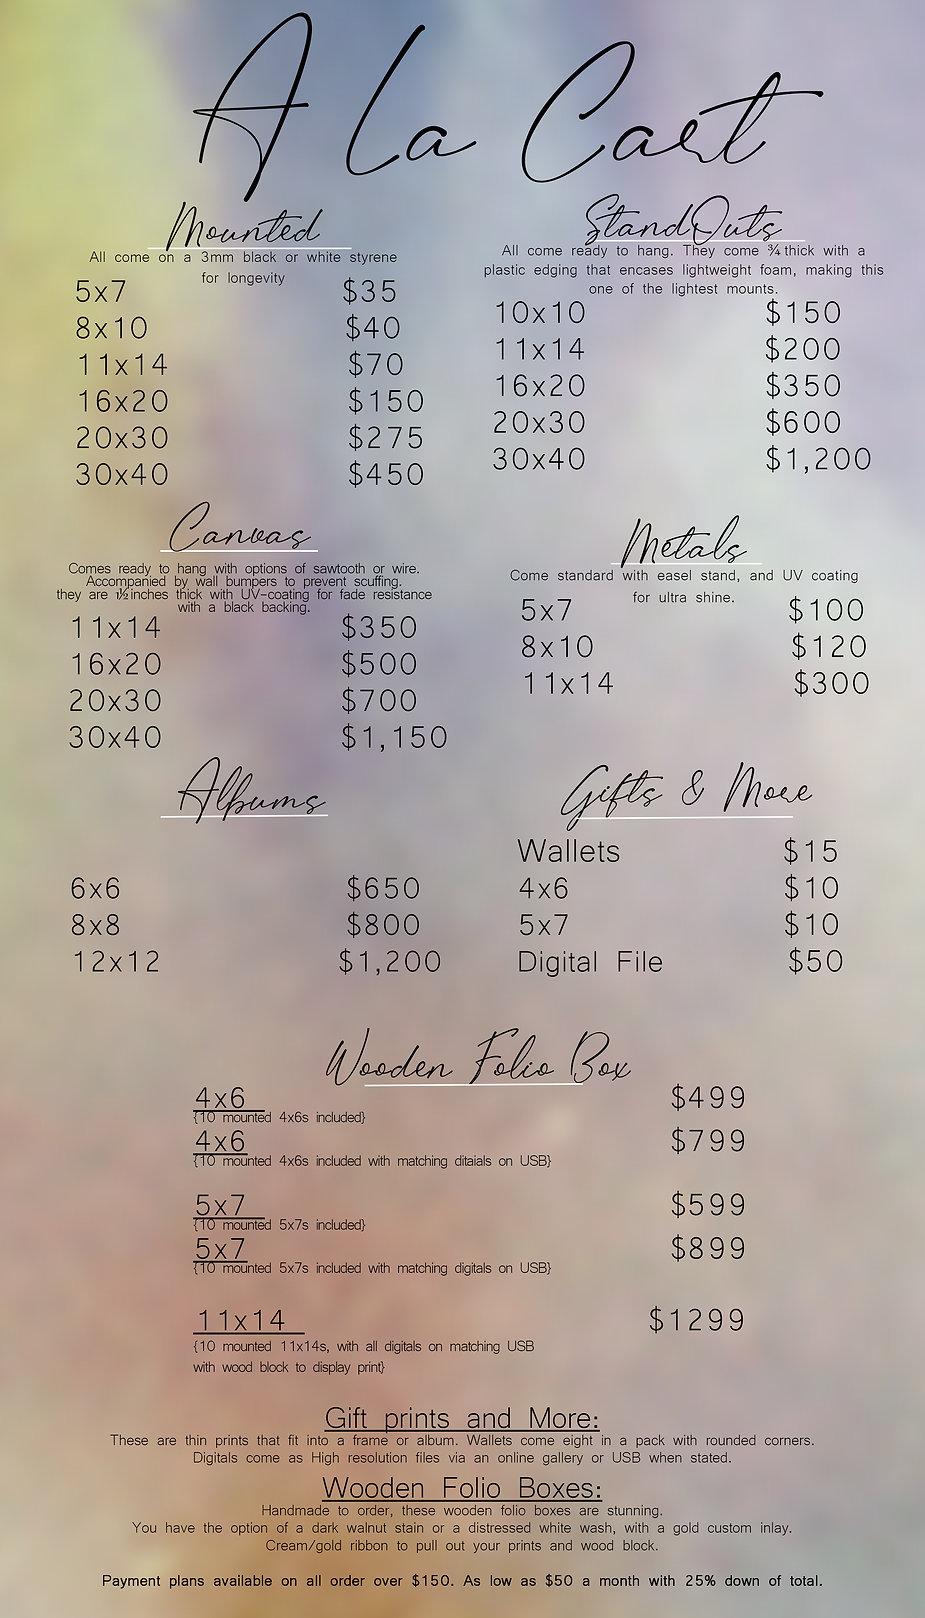 300 dpi a la cart pricing-Recovered 2021